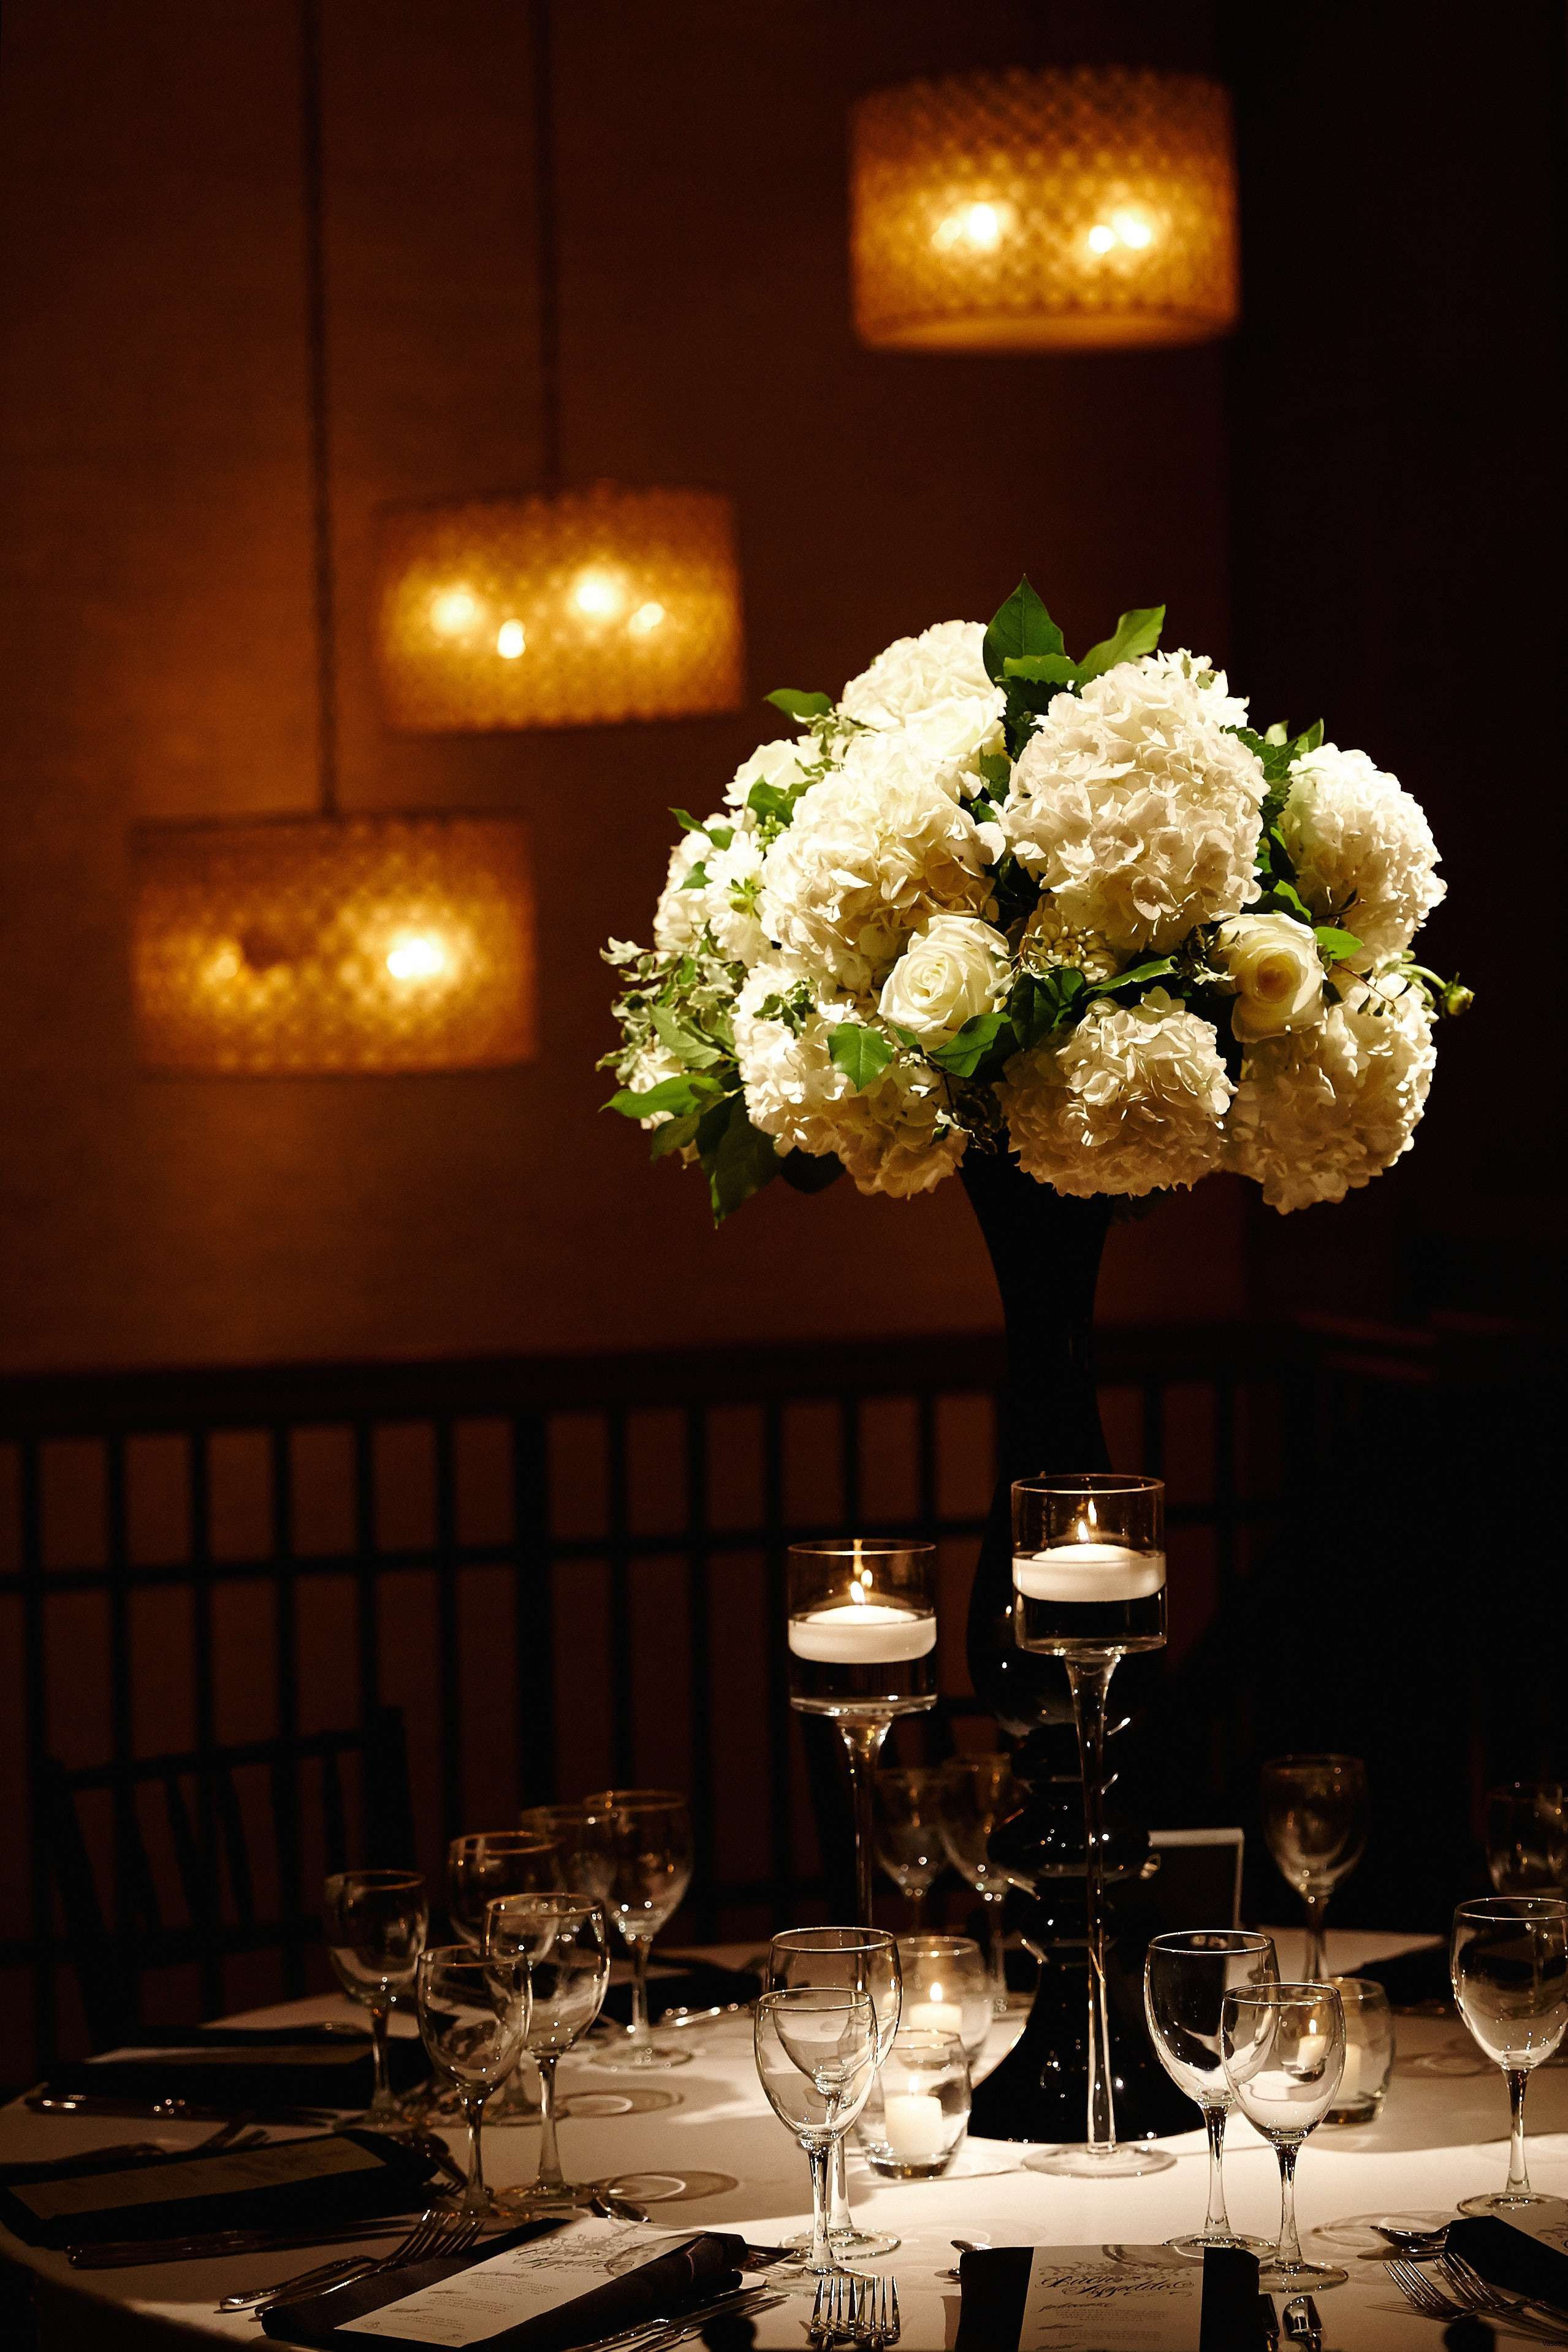 white floor vase modern of 25 lovely kitchen table vases kitchen ideas with regard to il fullxfull h vases black vase white flowers zoomi 0d with design